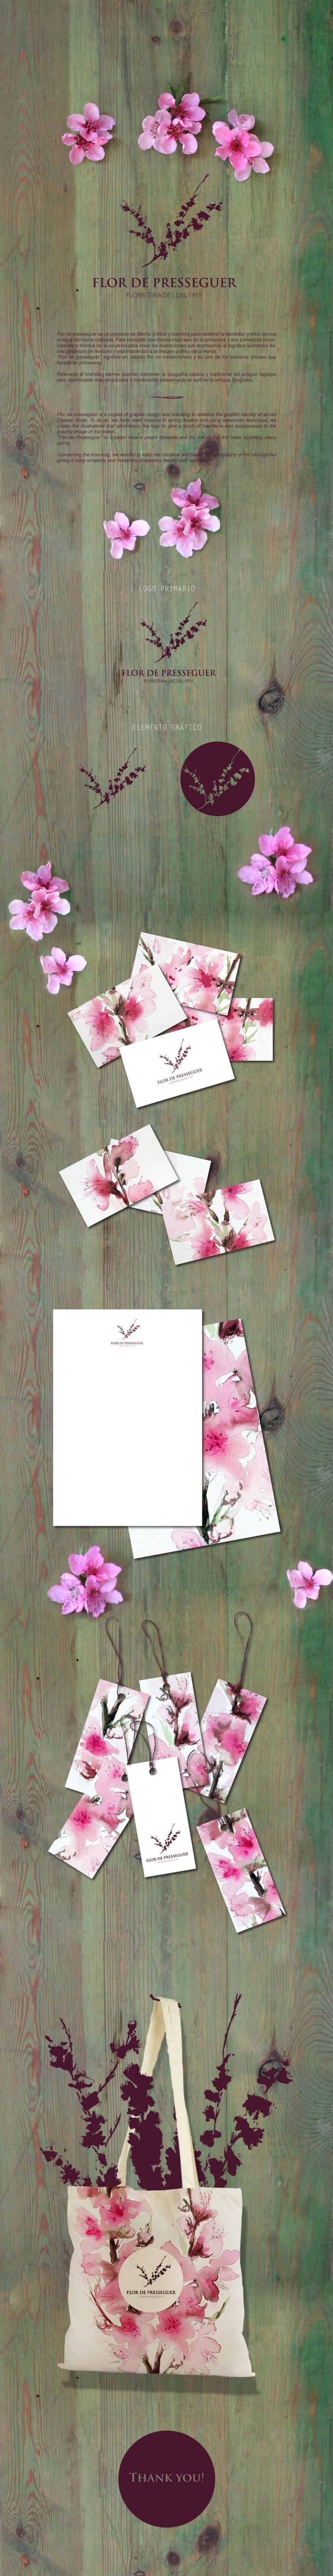 Flor de presseguer -1